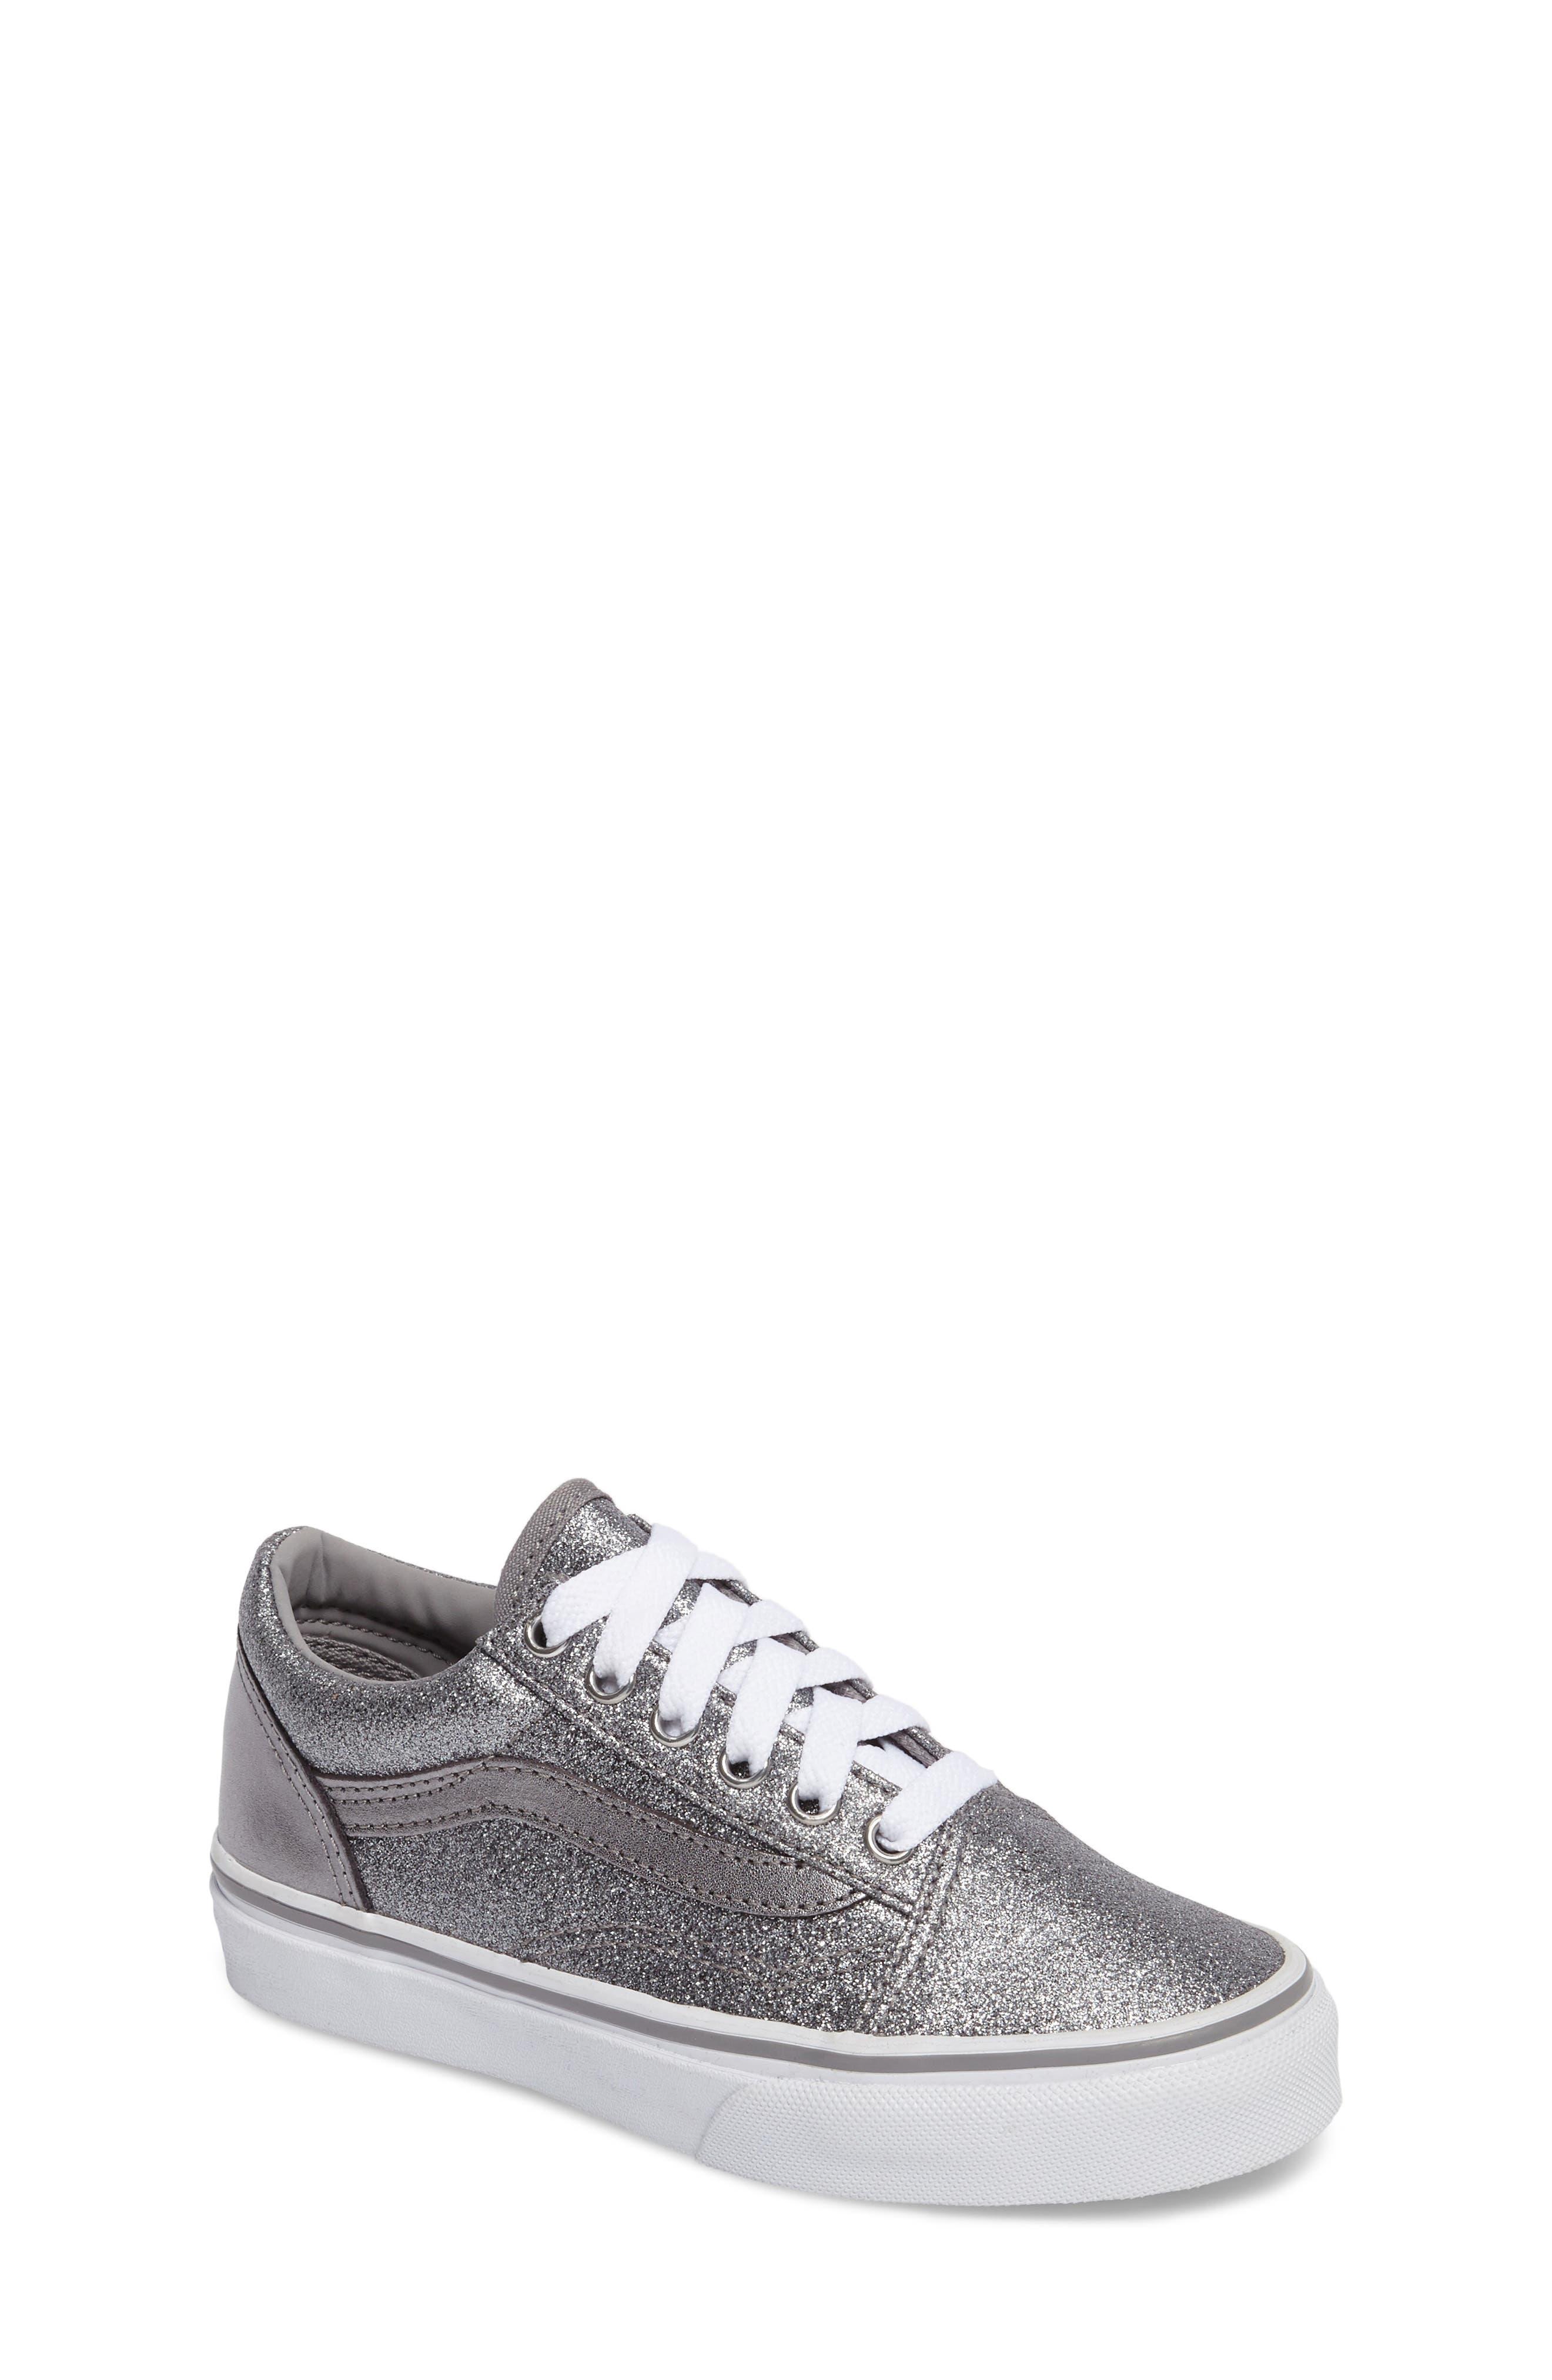 Old Skool Glitter Sneaker,                         Main,                         color, 040